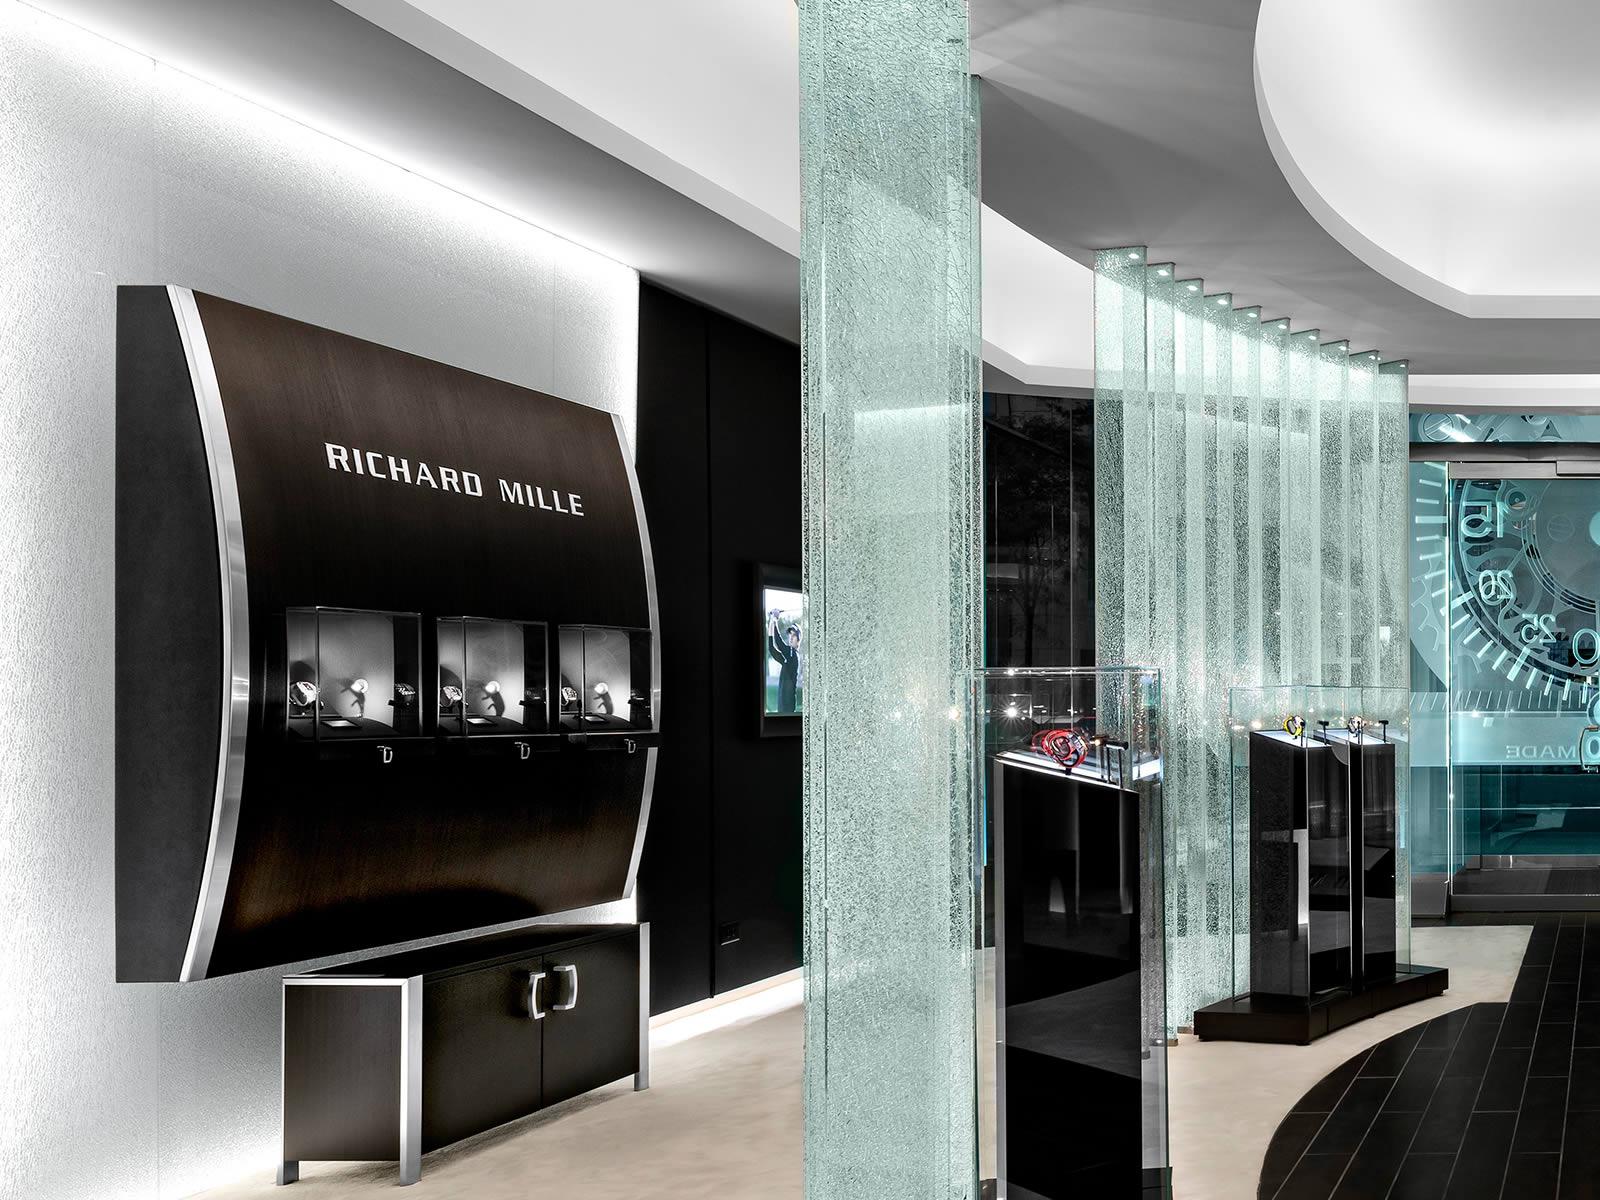 richard-mille-new-york-butik-4-.jpg